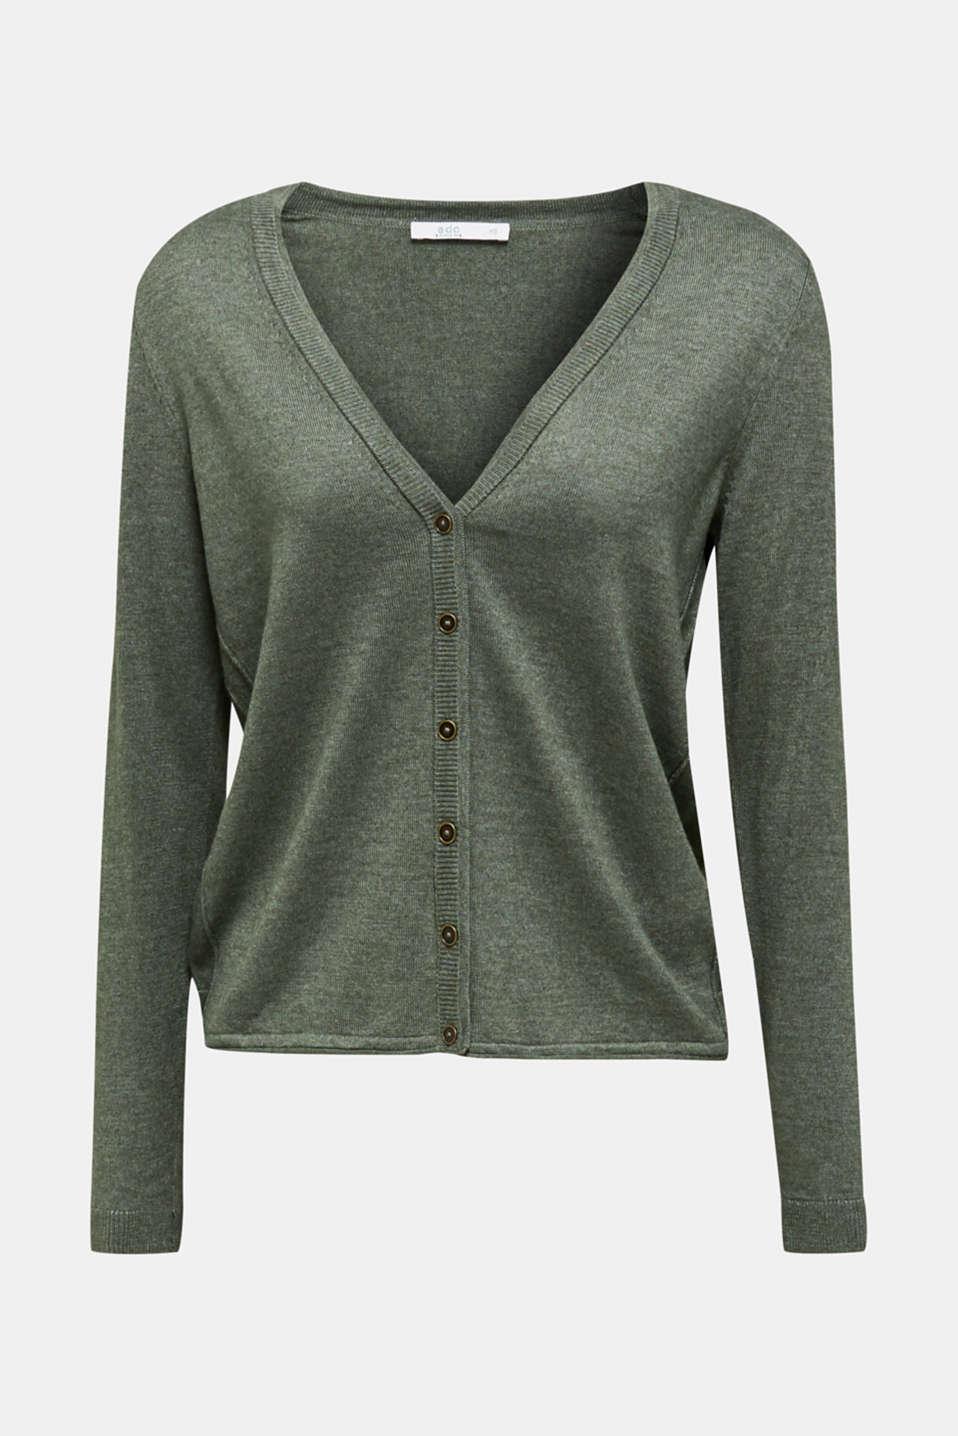 Fine-knit blended cotton cardigan, KHAKI GREEN 5, detail image number 6